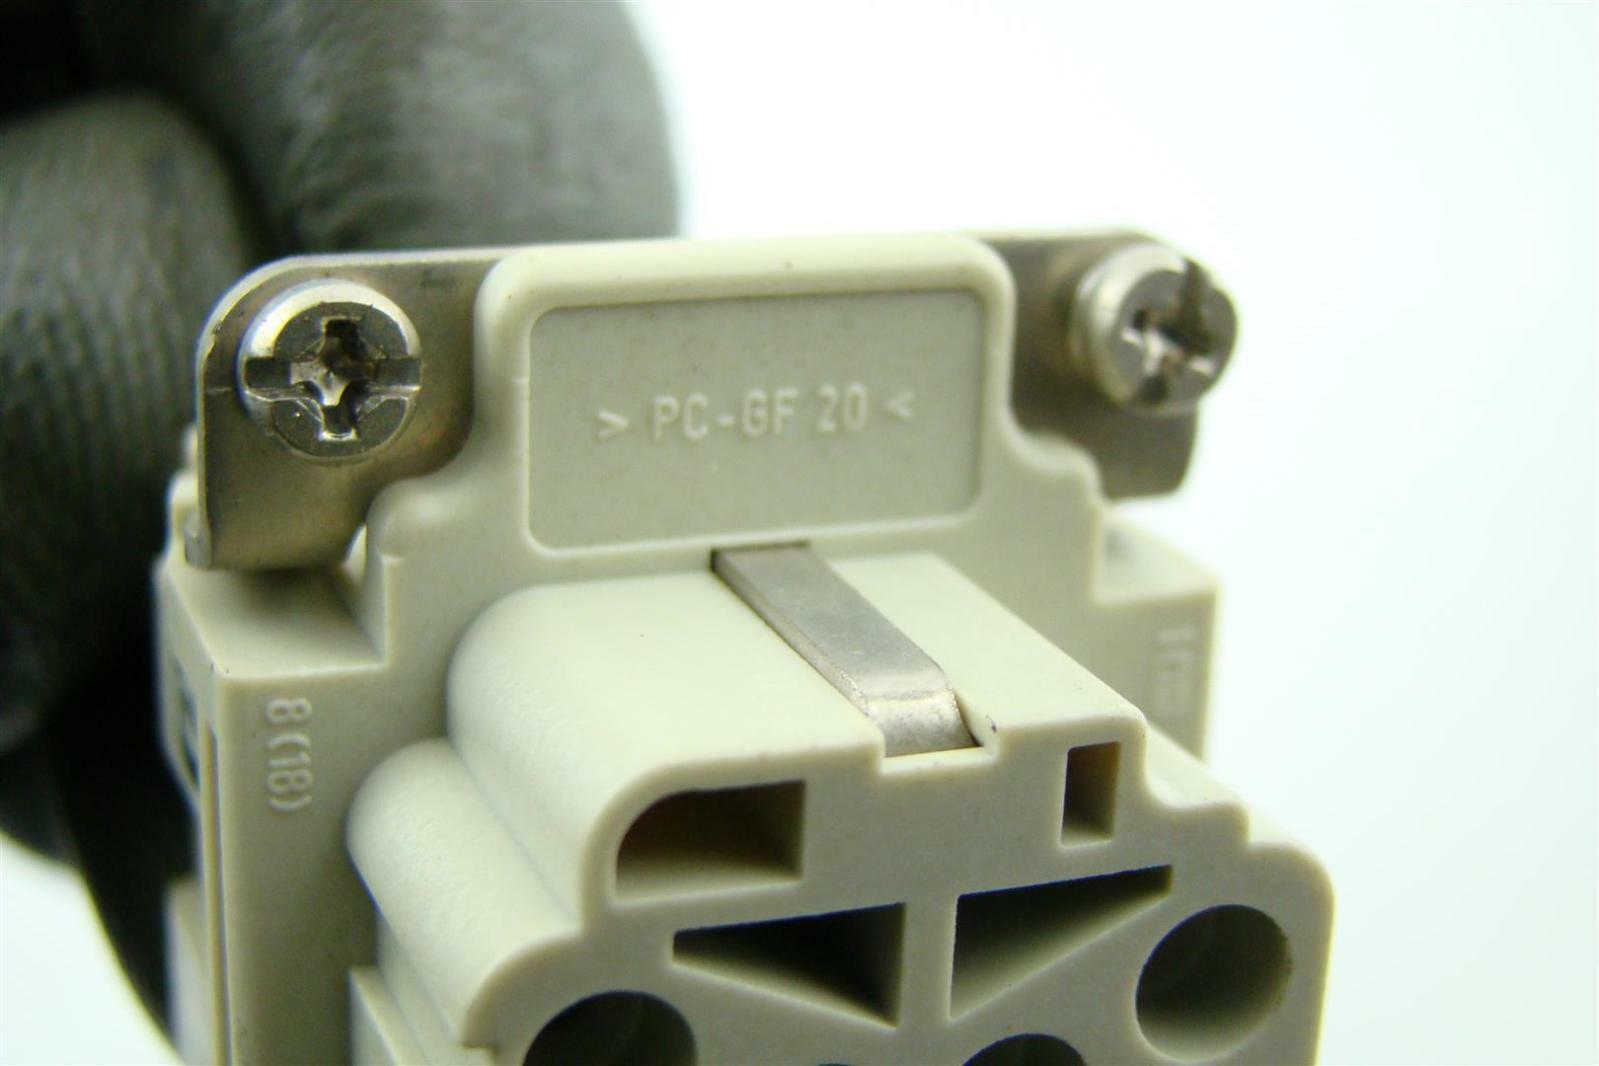 Harting 16A 500V Female Connector Plug Aluminum Hood Housing Side Entry PC-GF 20